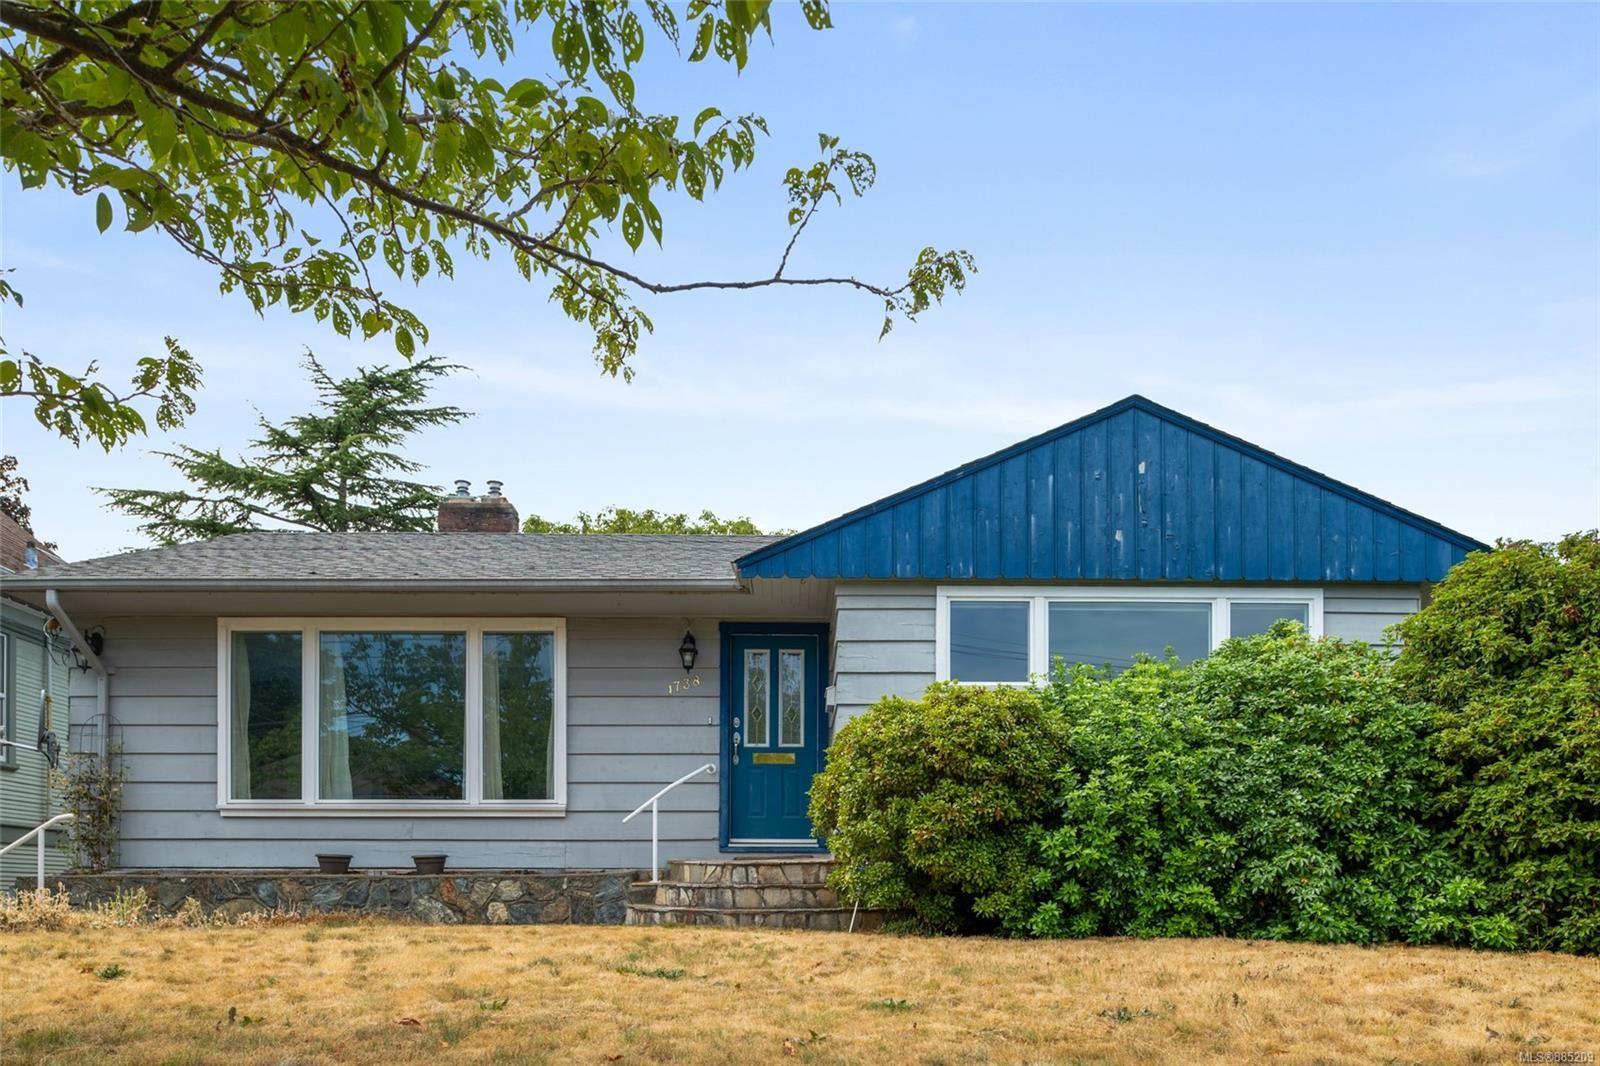 Main Photo: 1738 Davie St in : Vi Jubilee House for sale (Victoria)  : MLS®# 885209